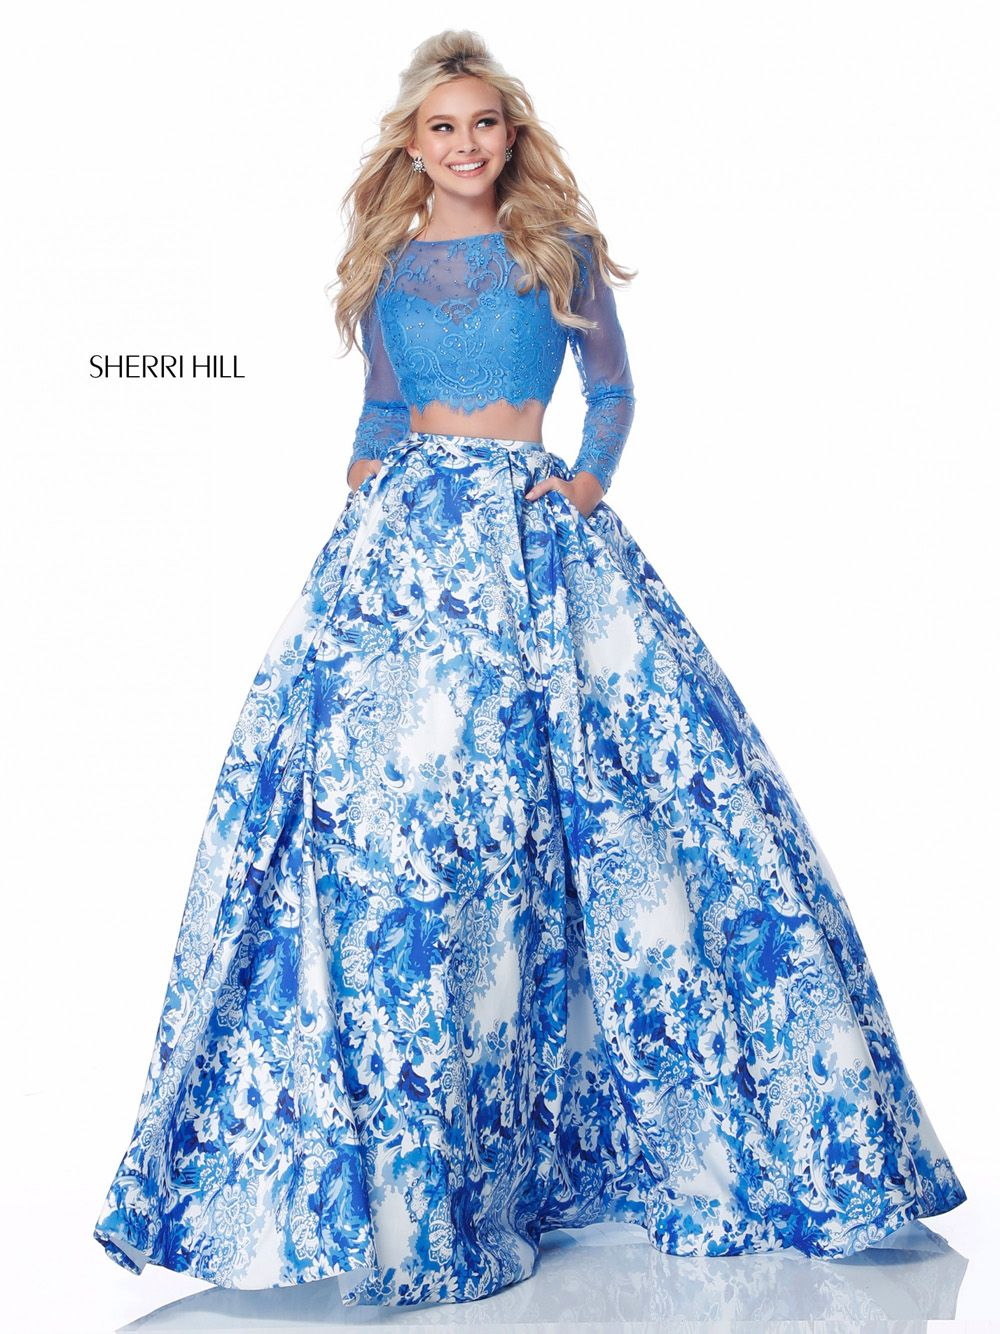 Sherri Hill 51961 | Prom, Sherri hill prom dresses and Prom dress stores